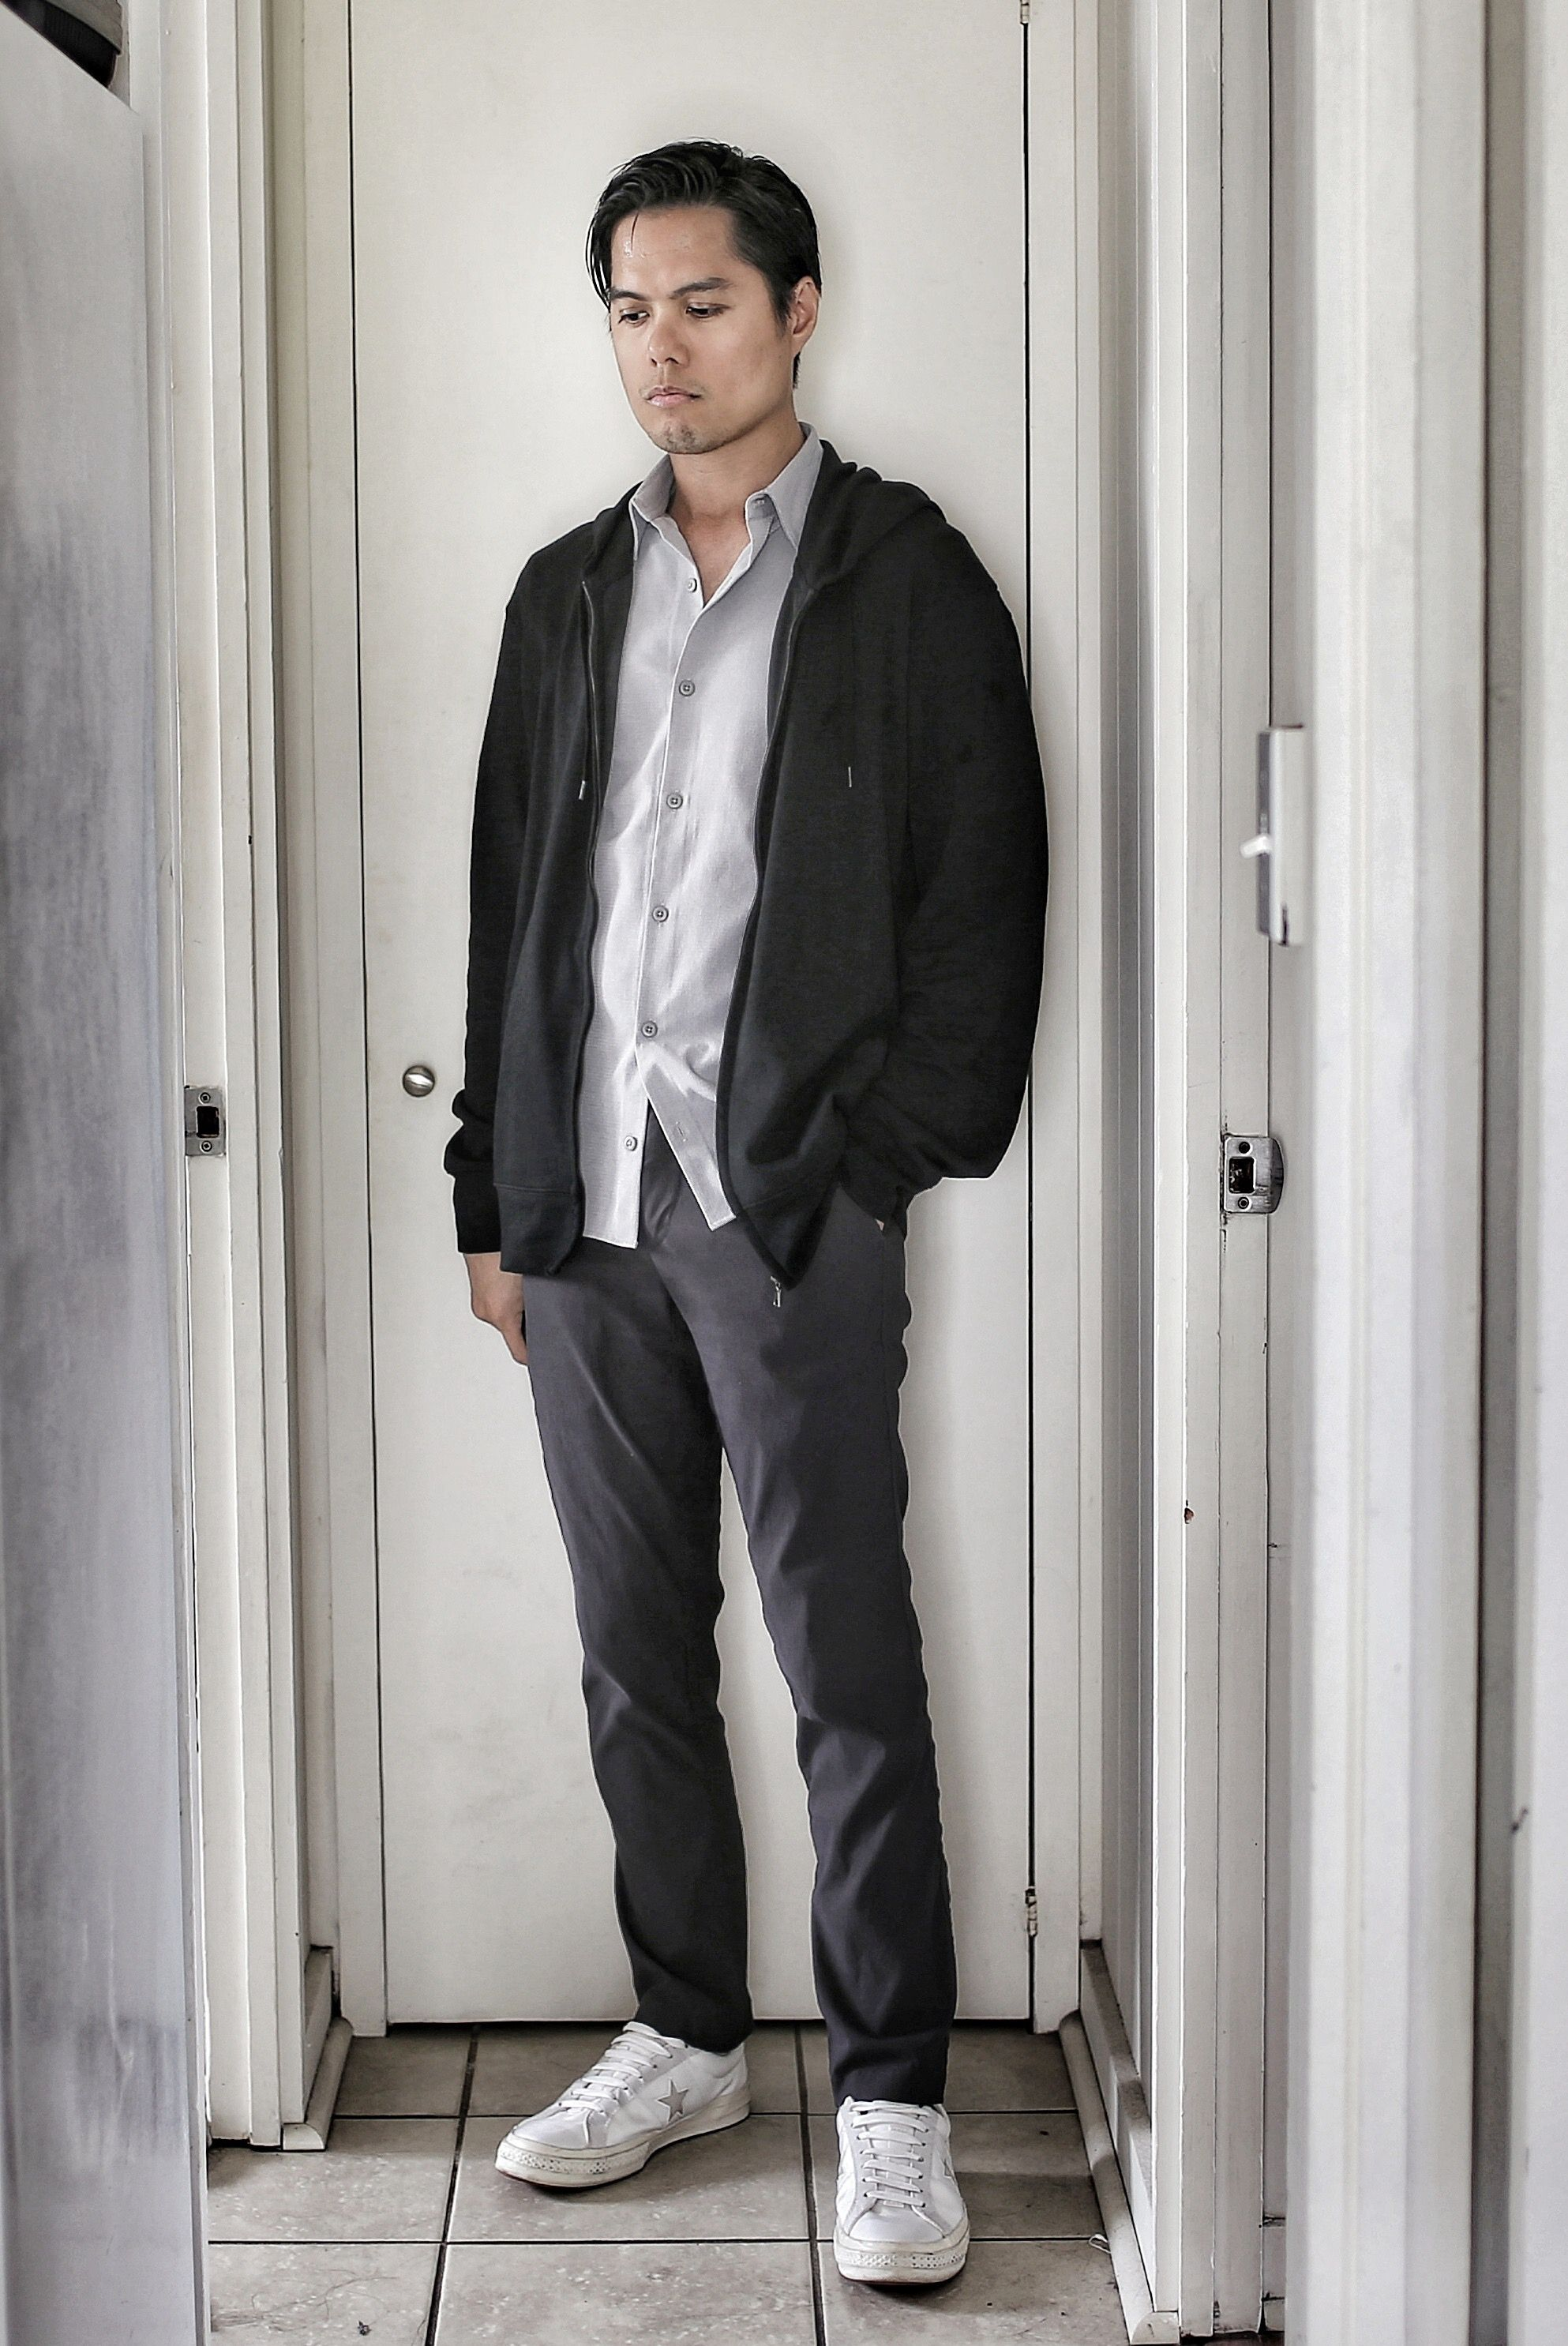 Pin By Nate Weeknd On Scandinavian Minimalist Style Minimalist Fashion Pantsuit Normcore